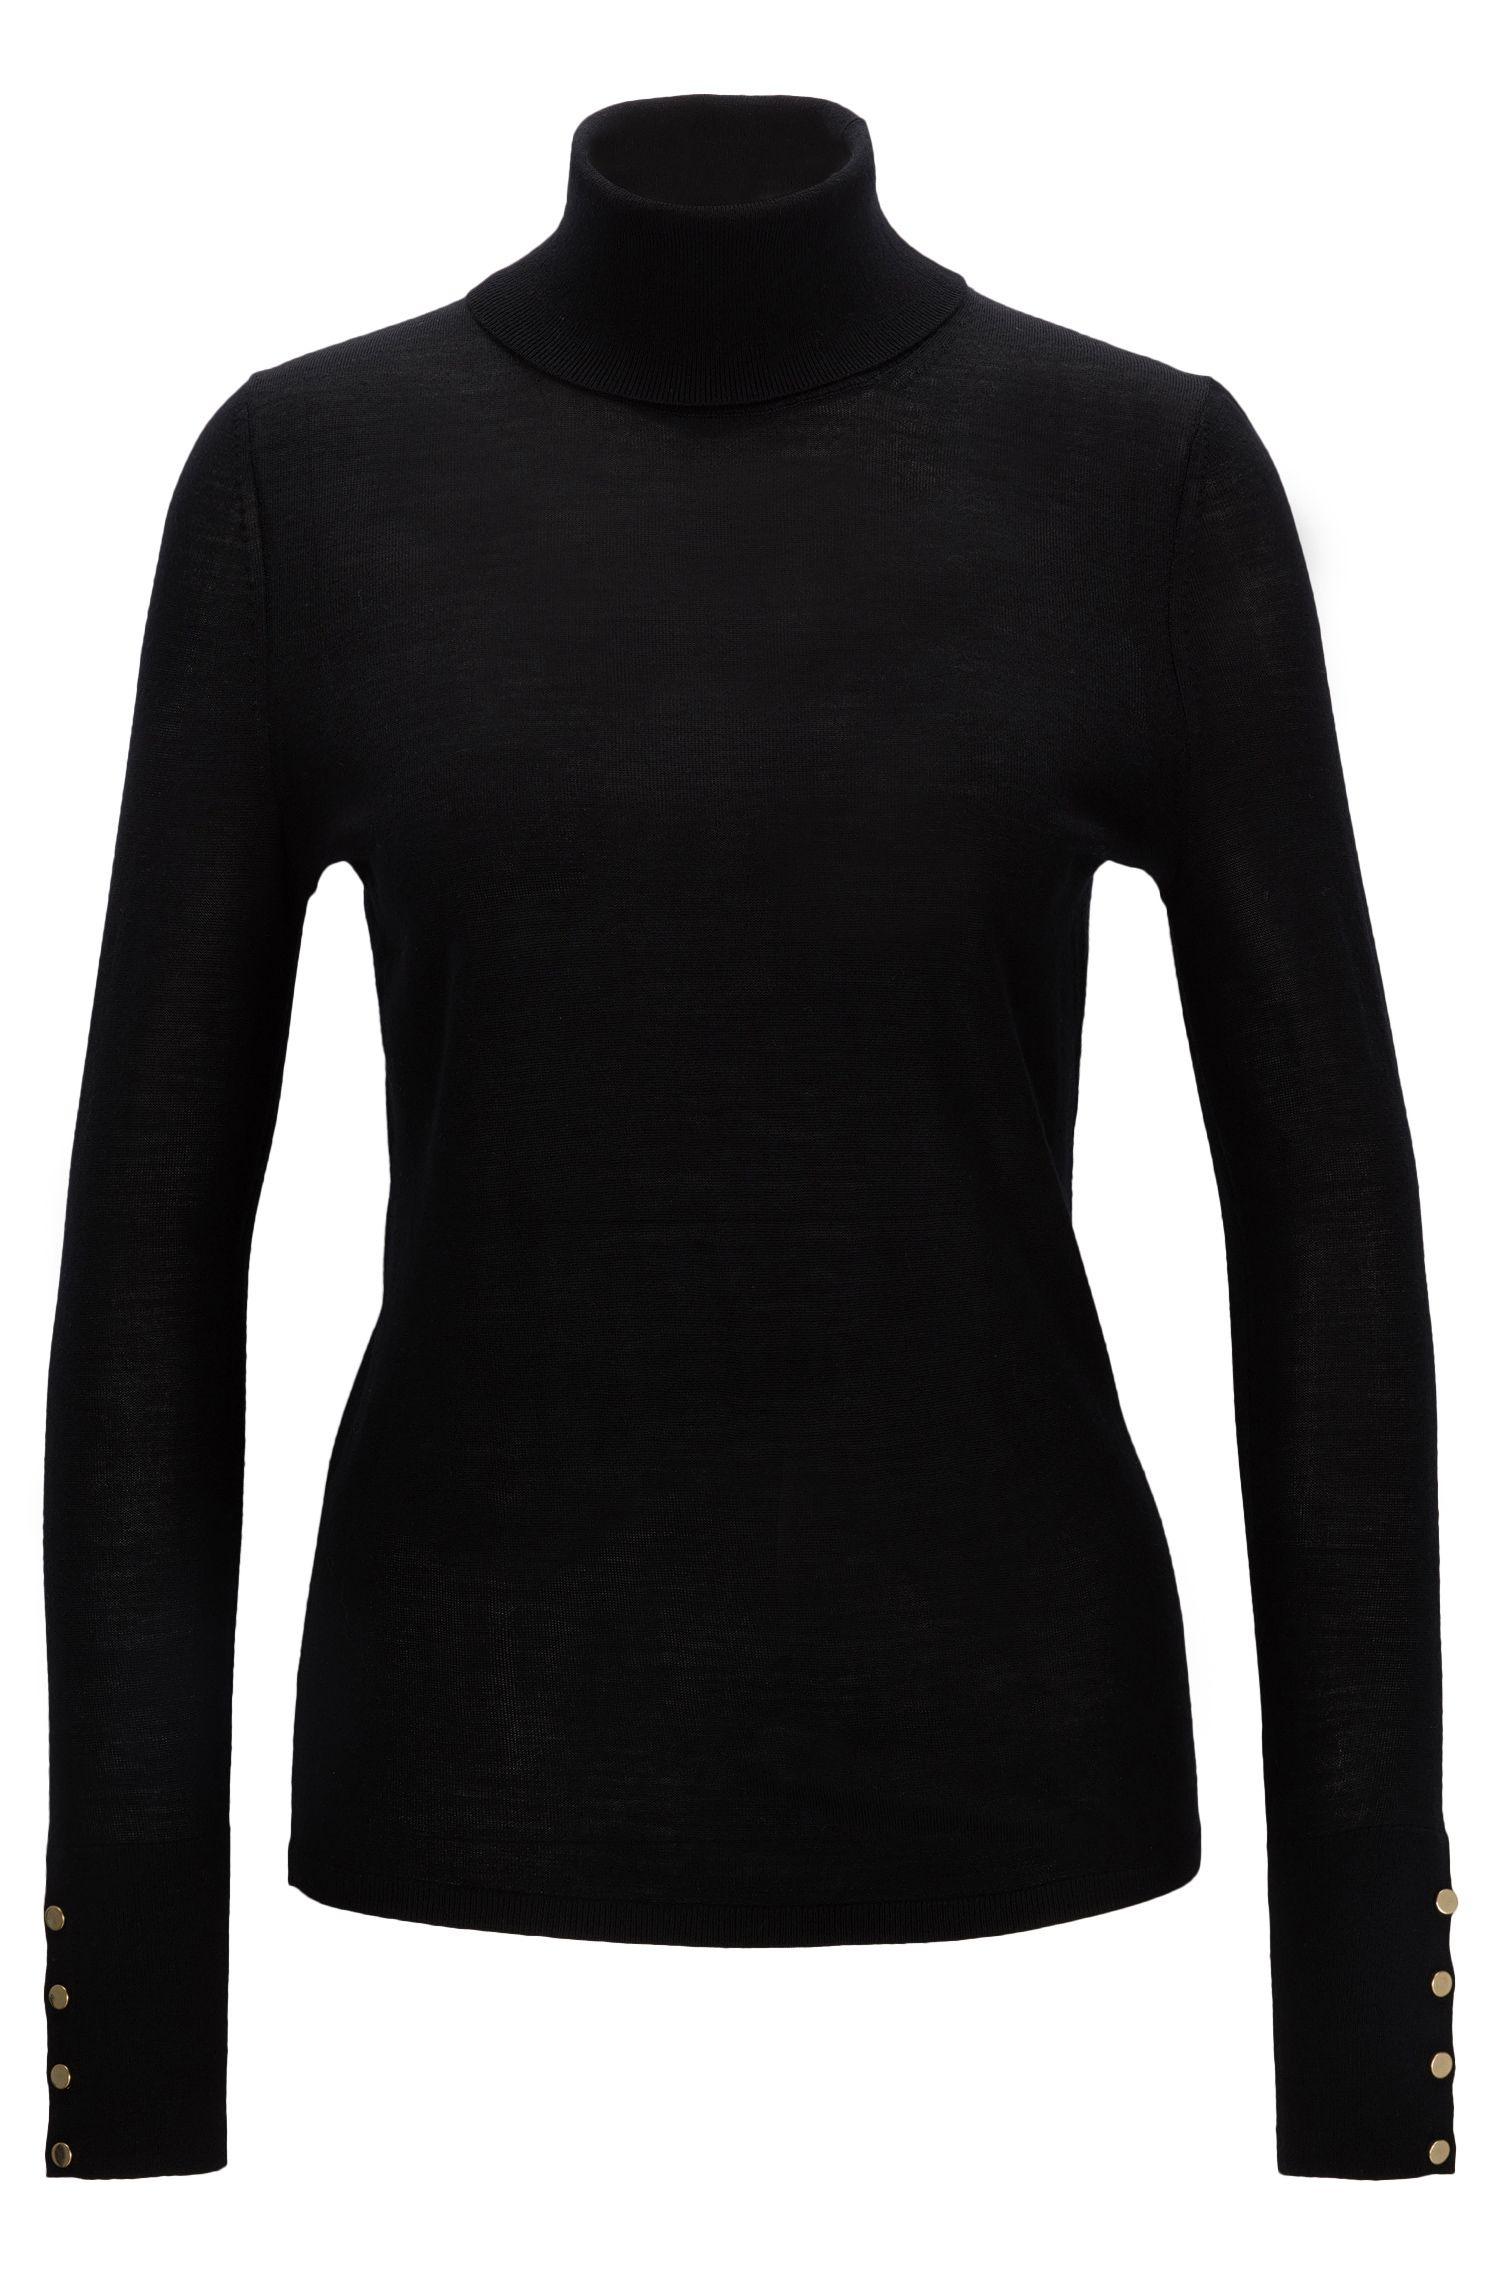 Virgin Wool Turtleneck Sweater | Farrella